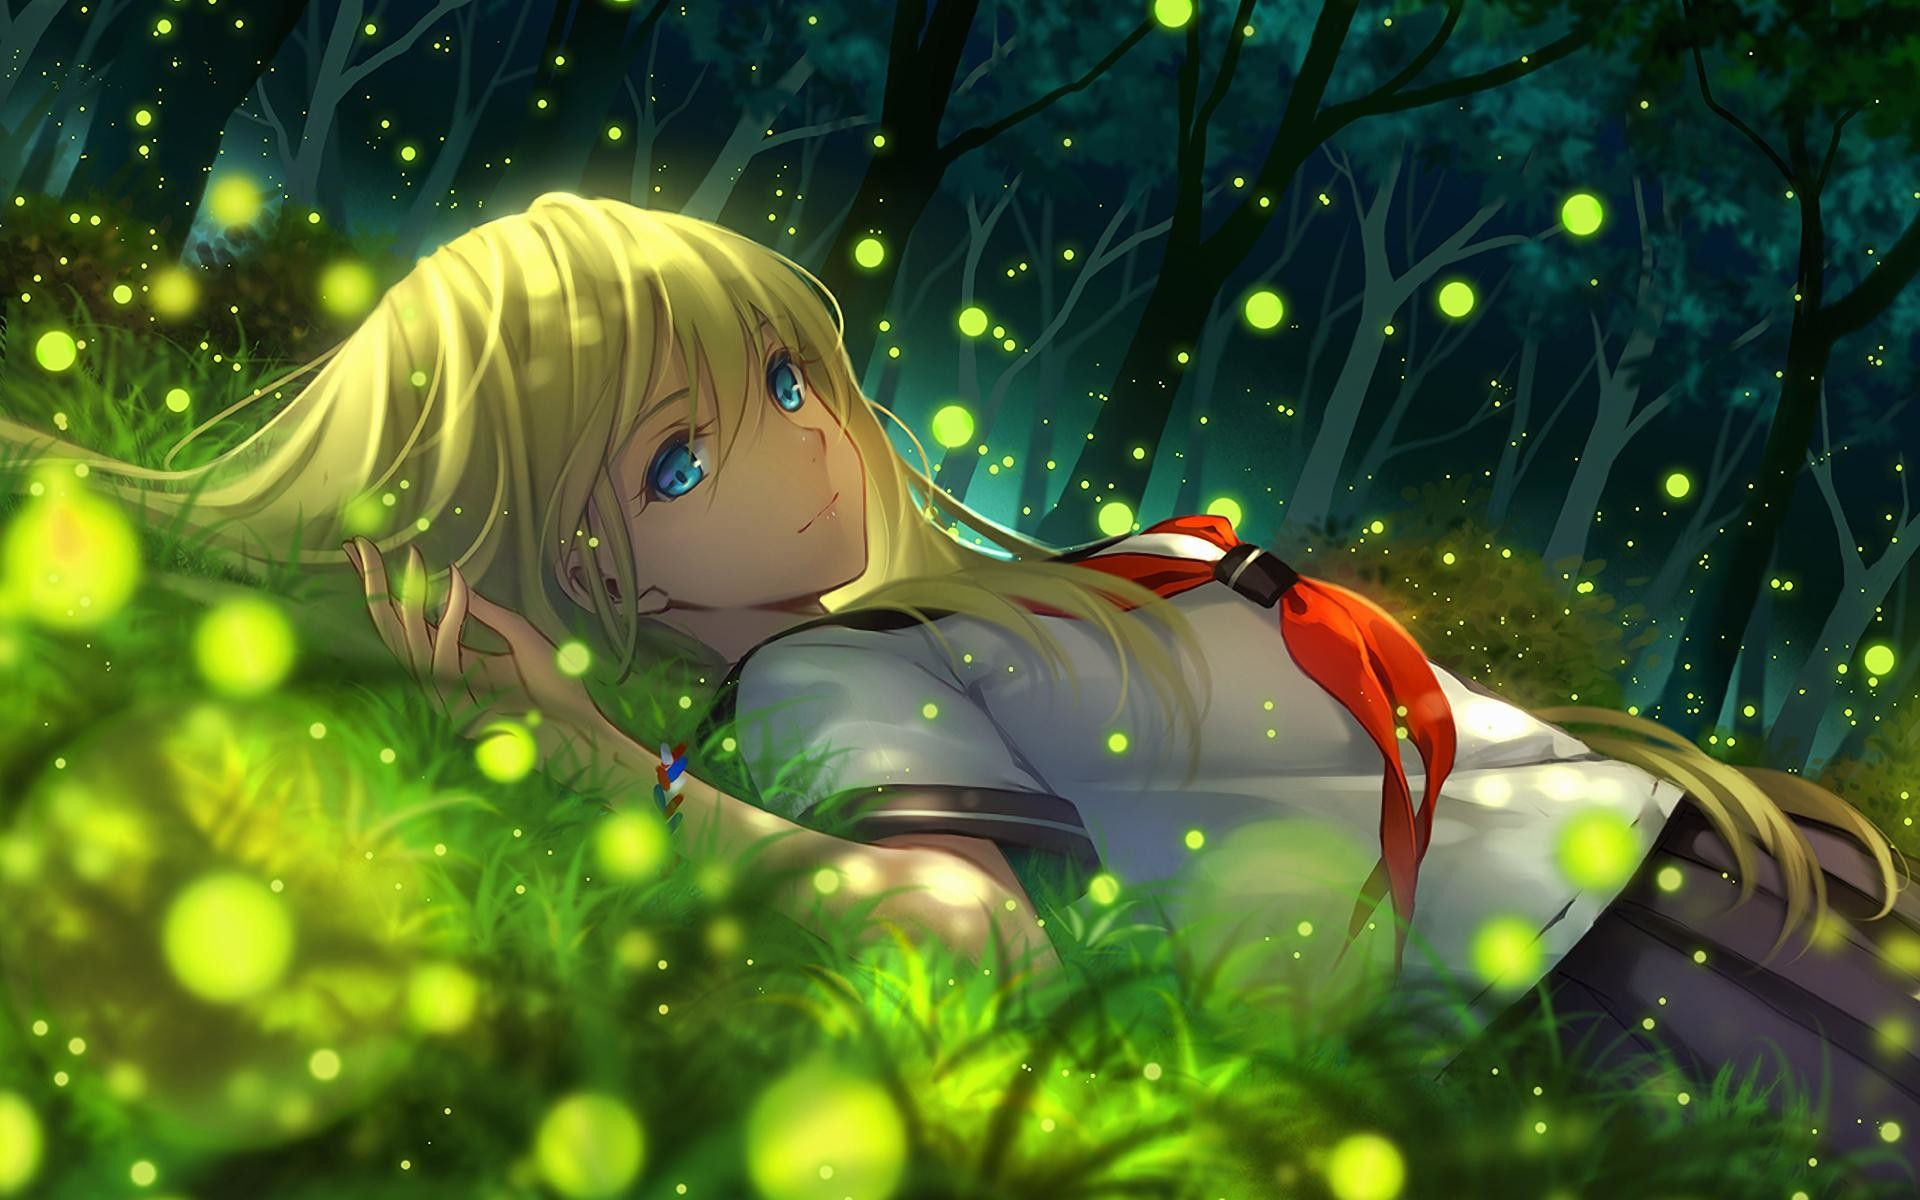 wallpaper.wiki-Anime-Wallaper-Music-HD-Download-PIC-